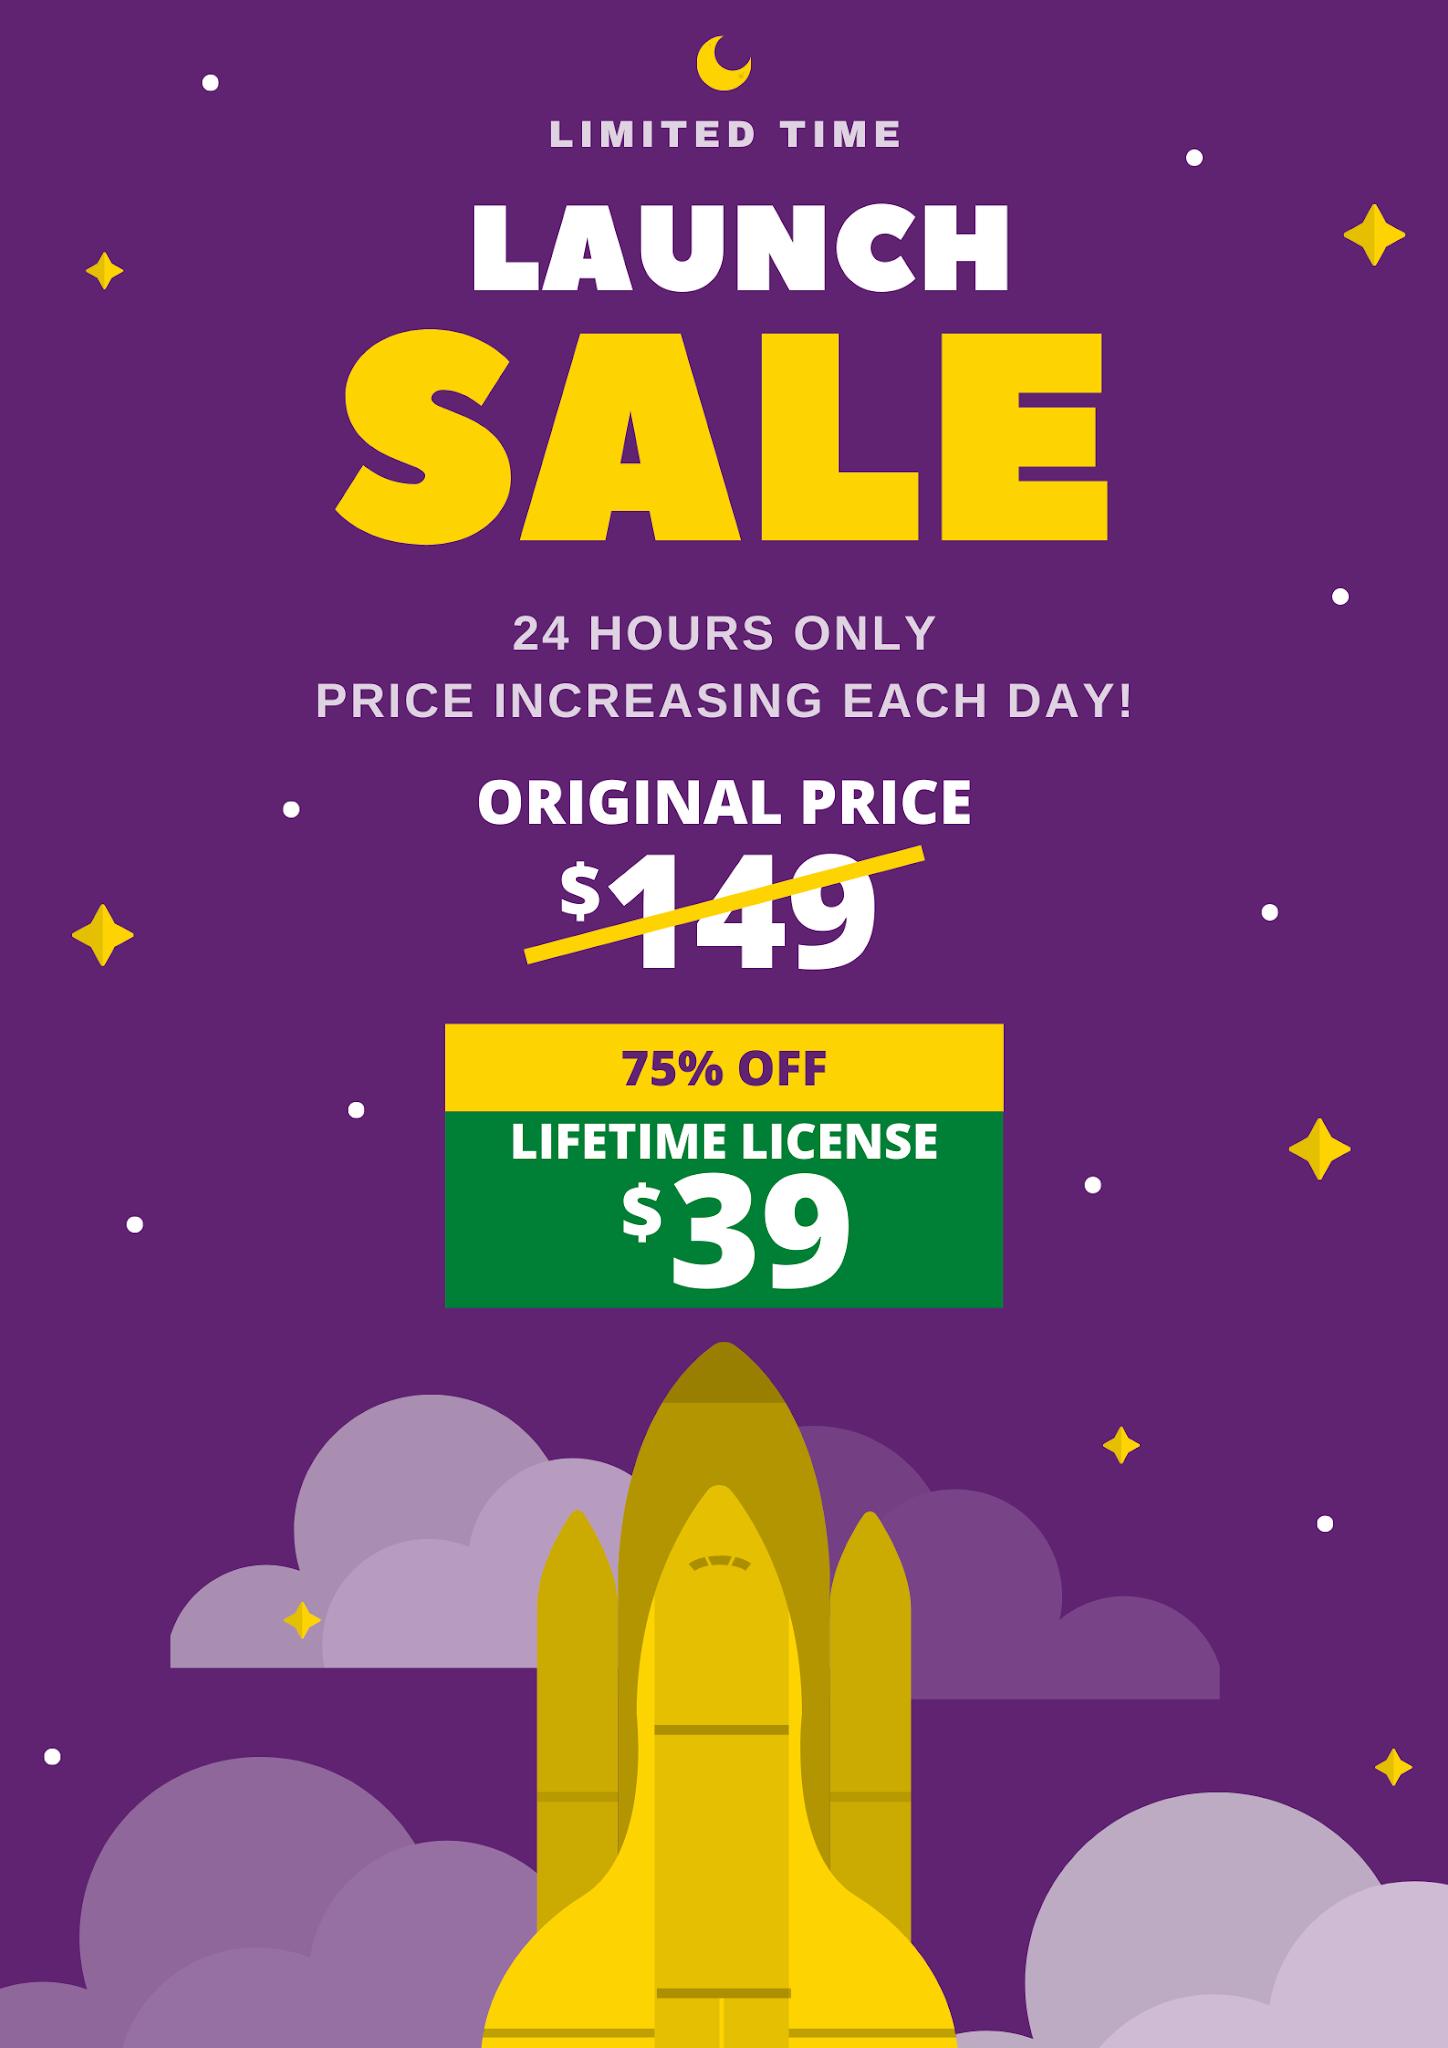 limited-launch-sale